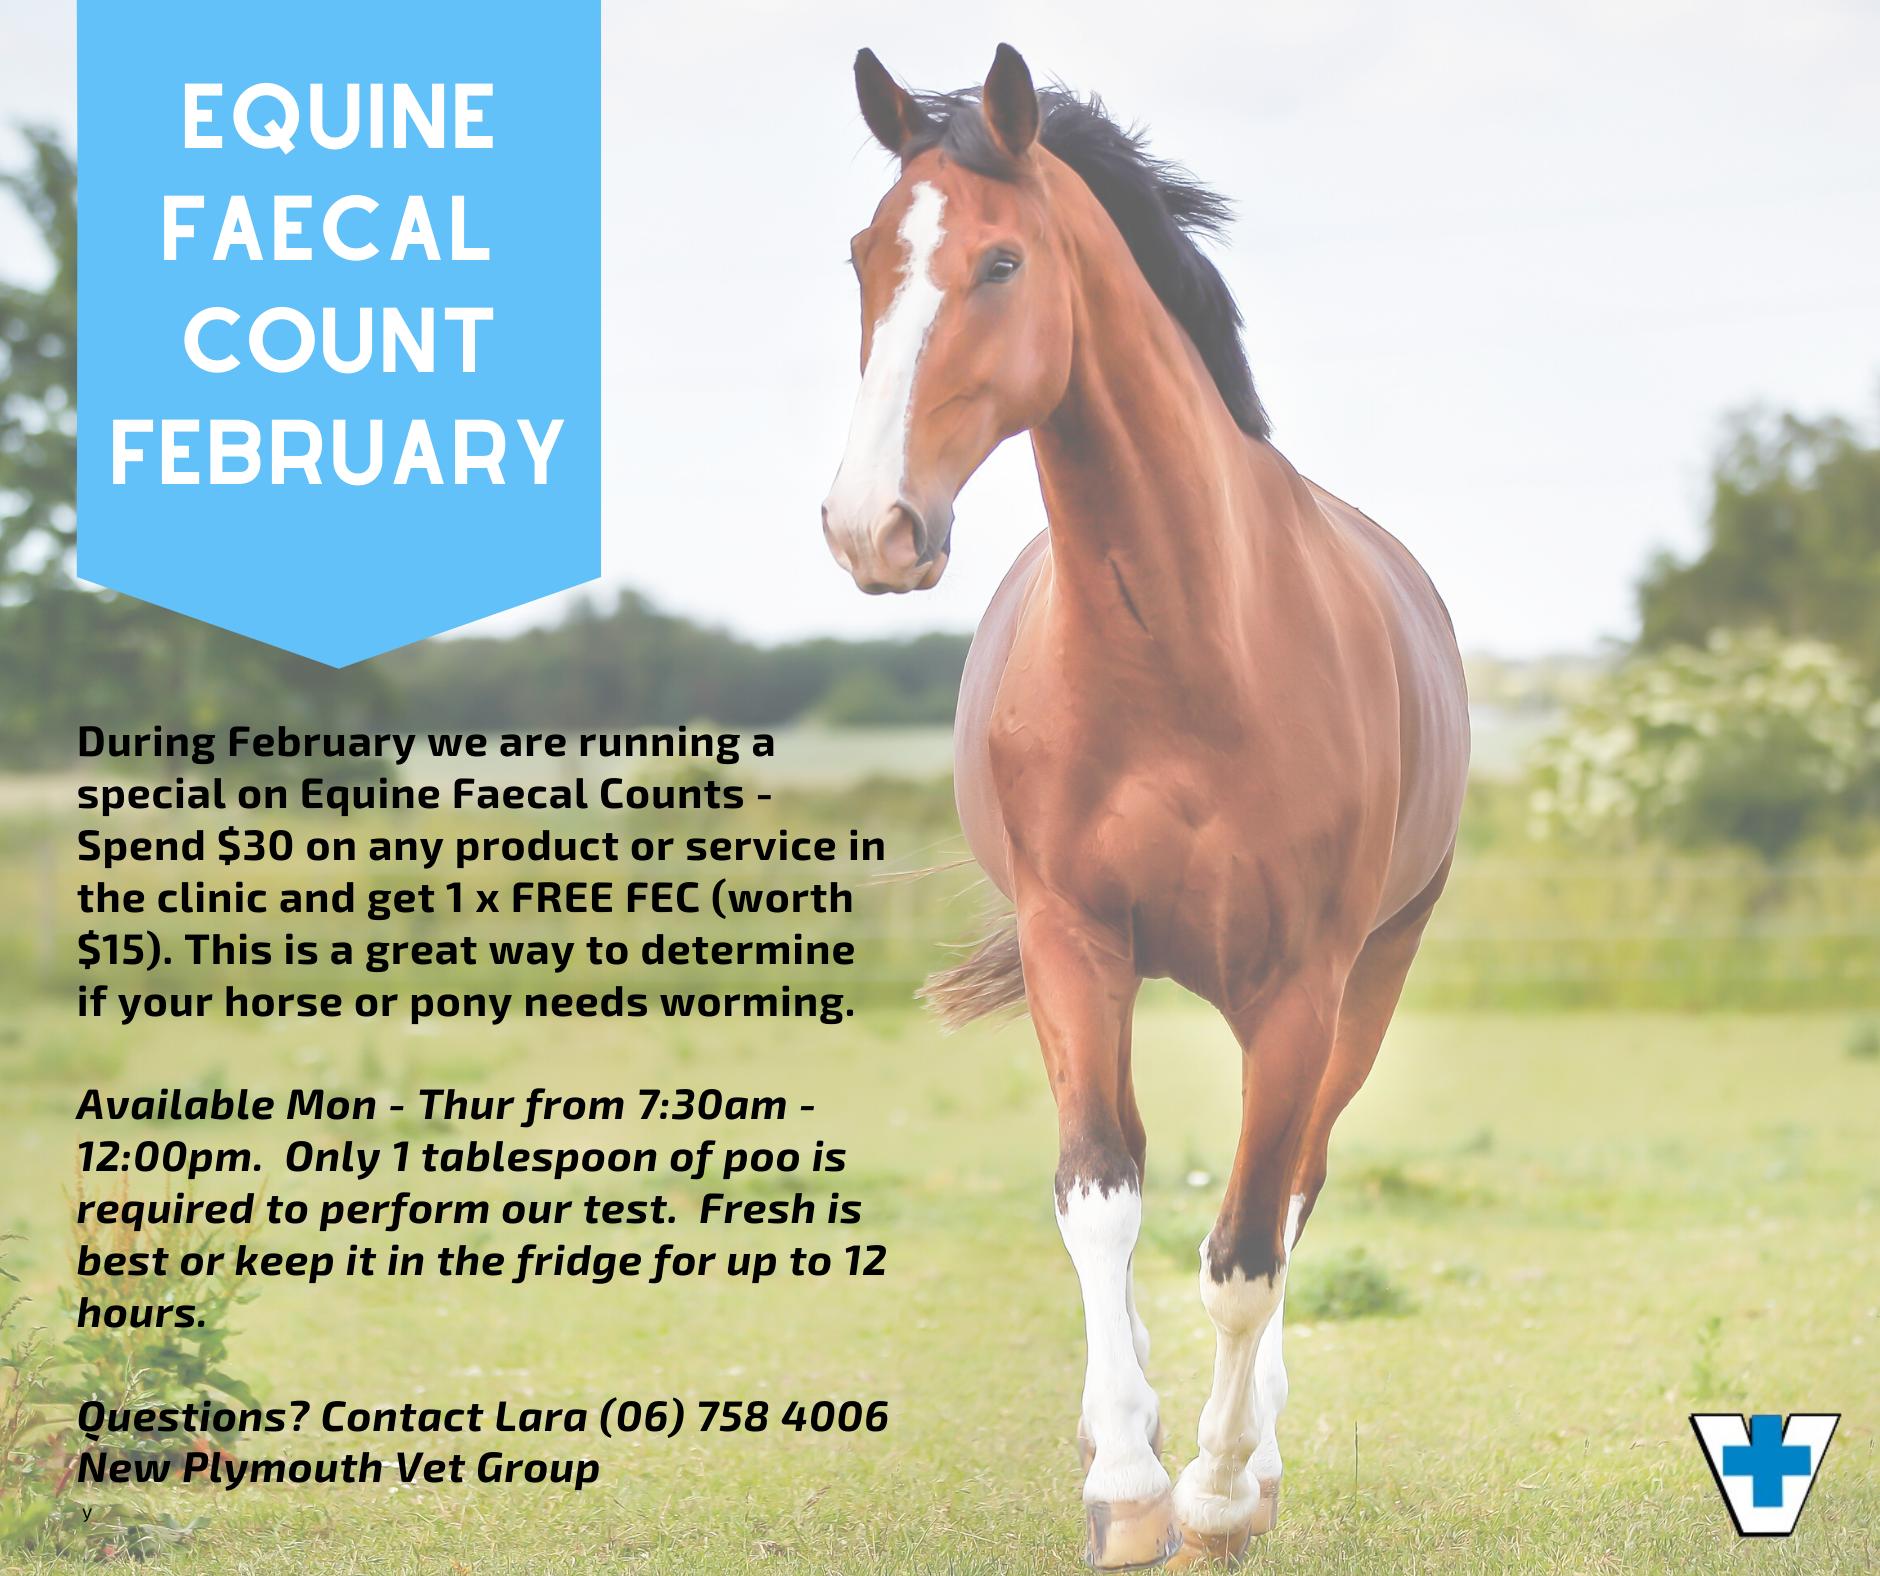 EQUINE – FAECAL COUNT FEBRUARY